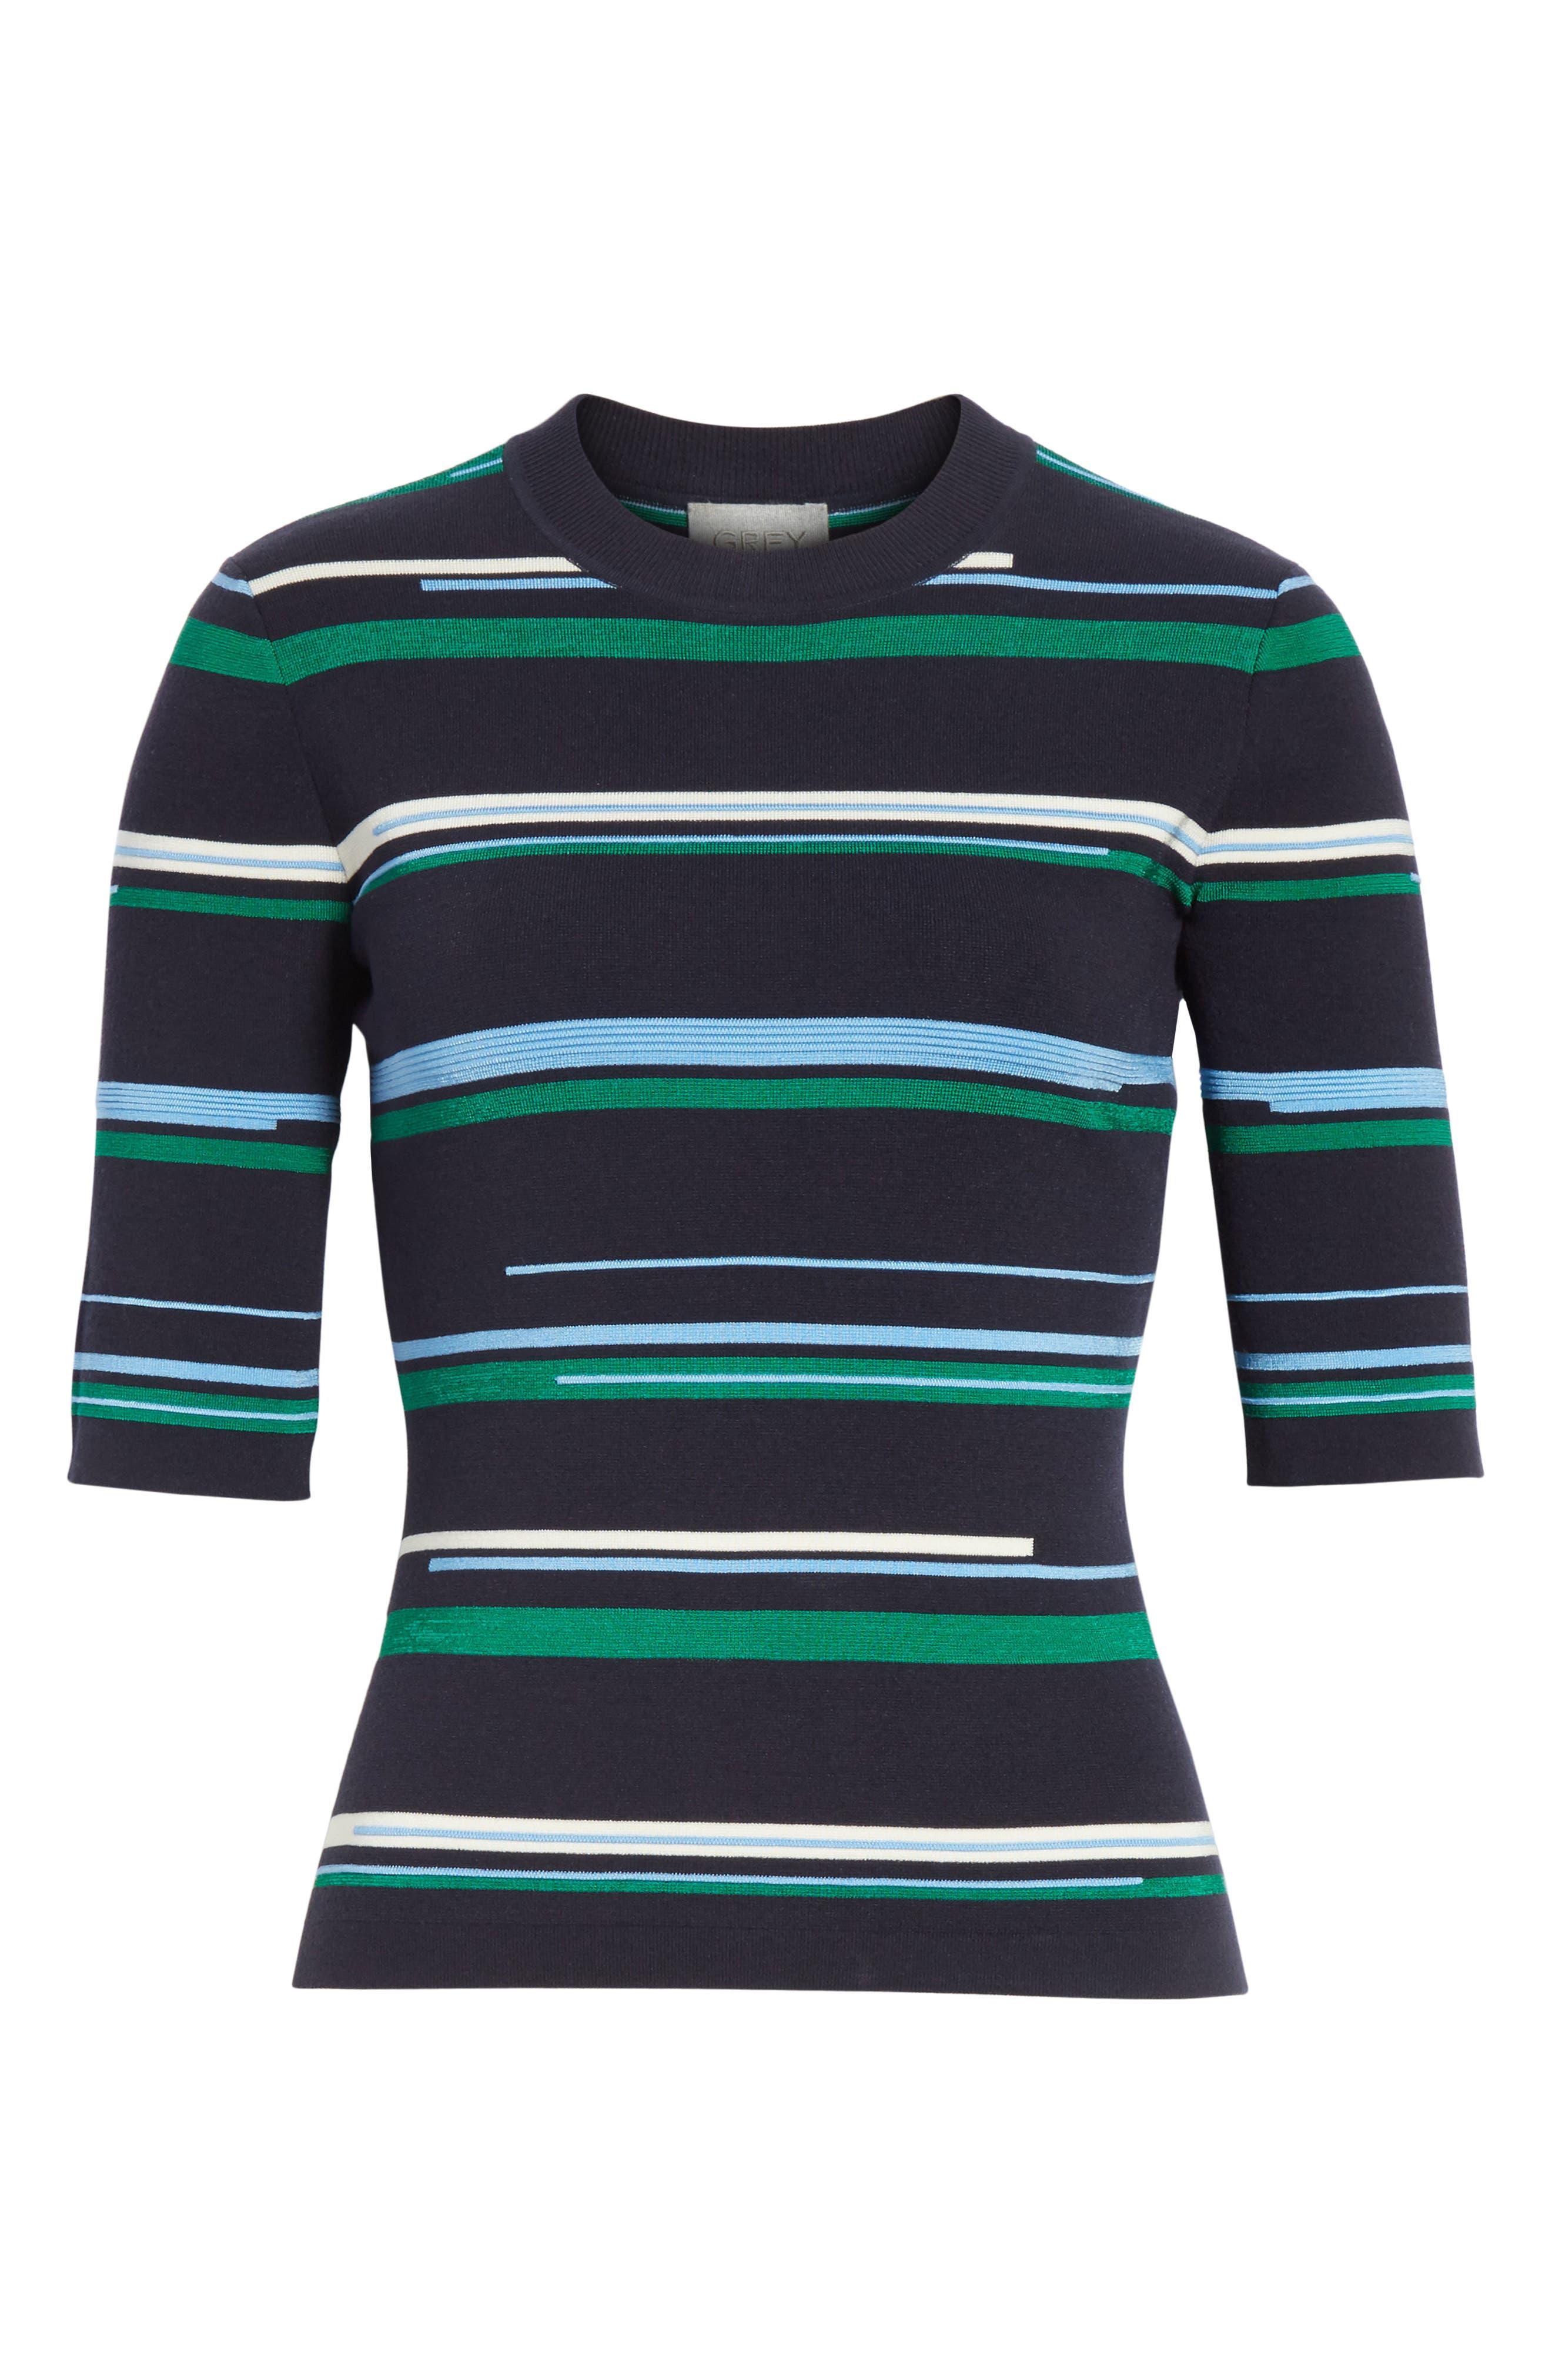 Stripe Knit Top,                             Alternate thumbnail 6, color,                             493